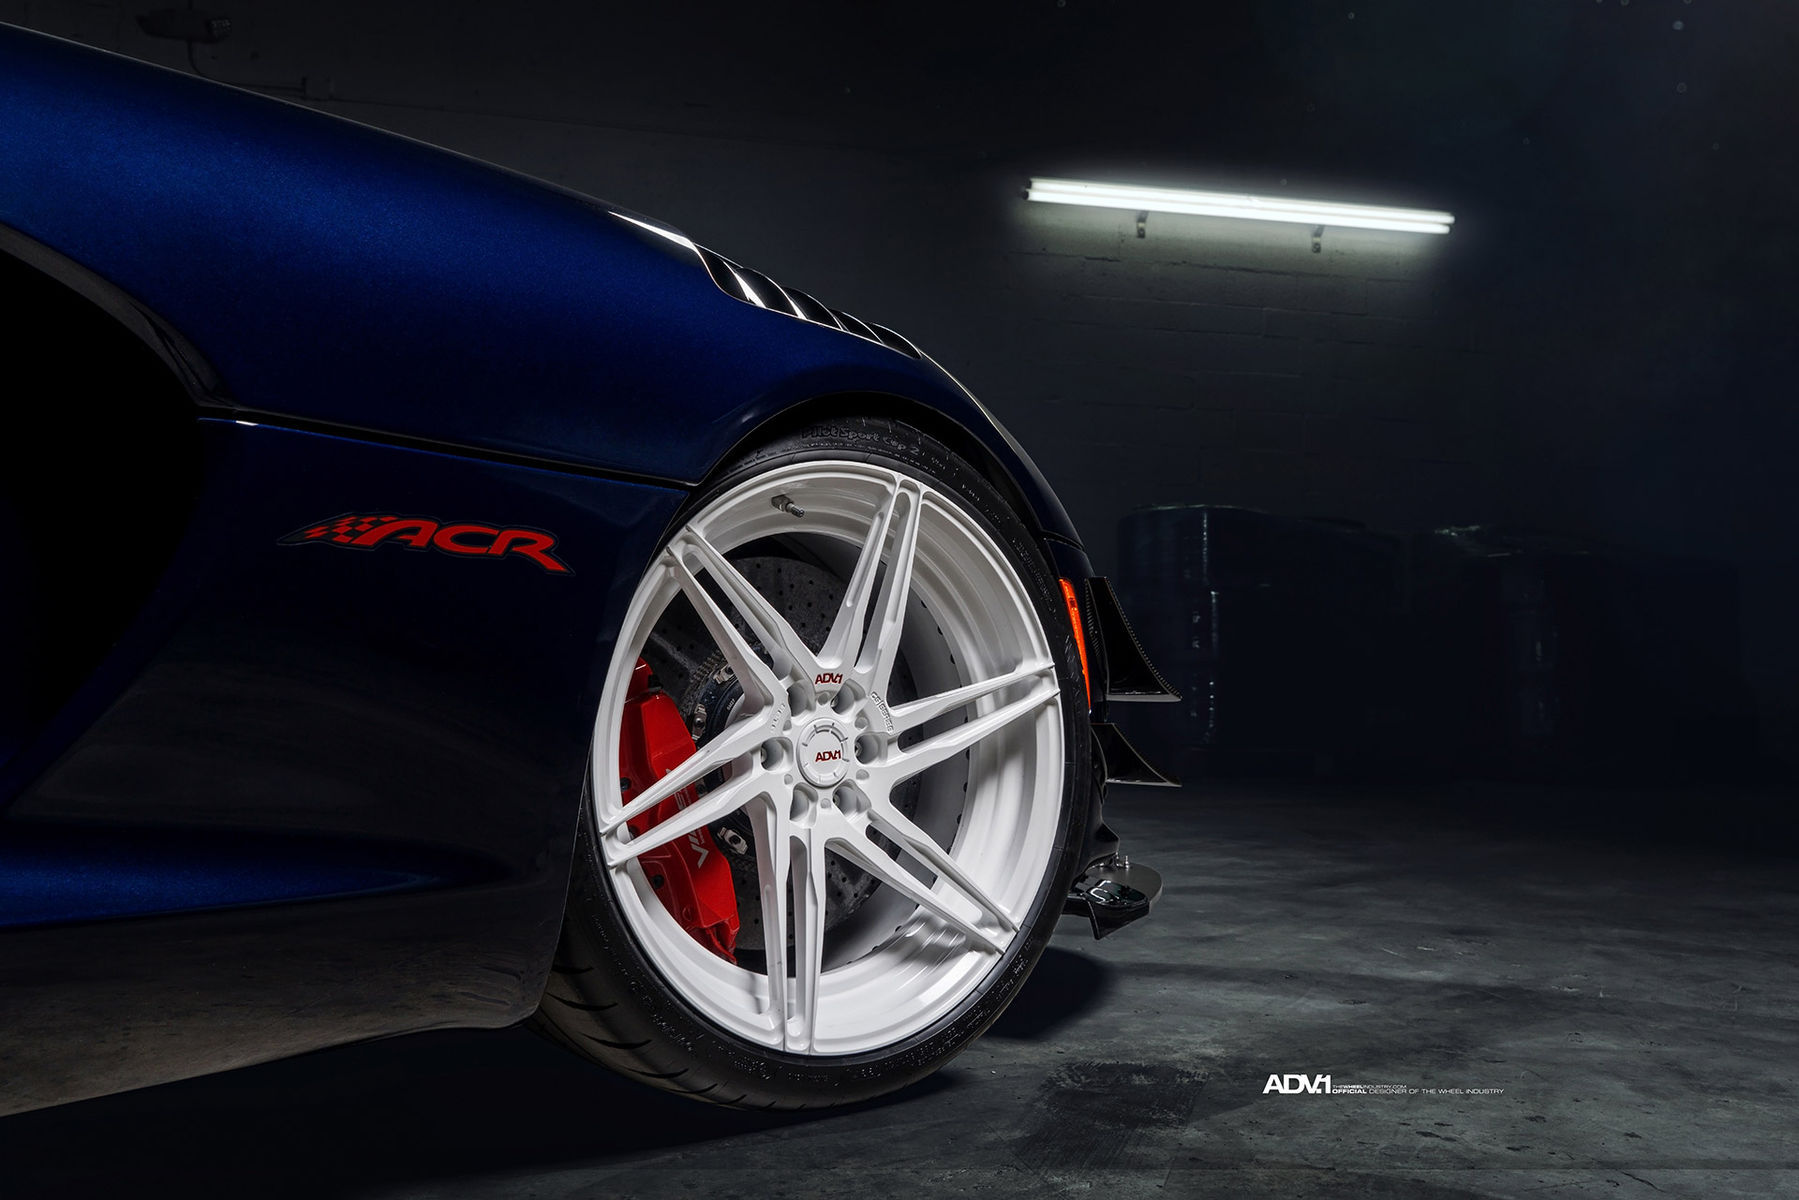 2016 Dodge Viper | ADV.1 Wheels Dodge Viper ACR